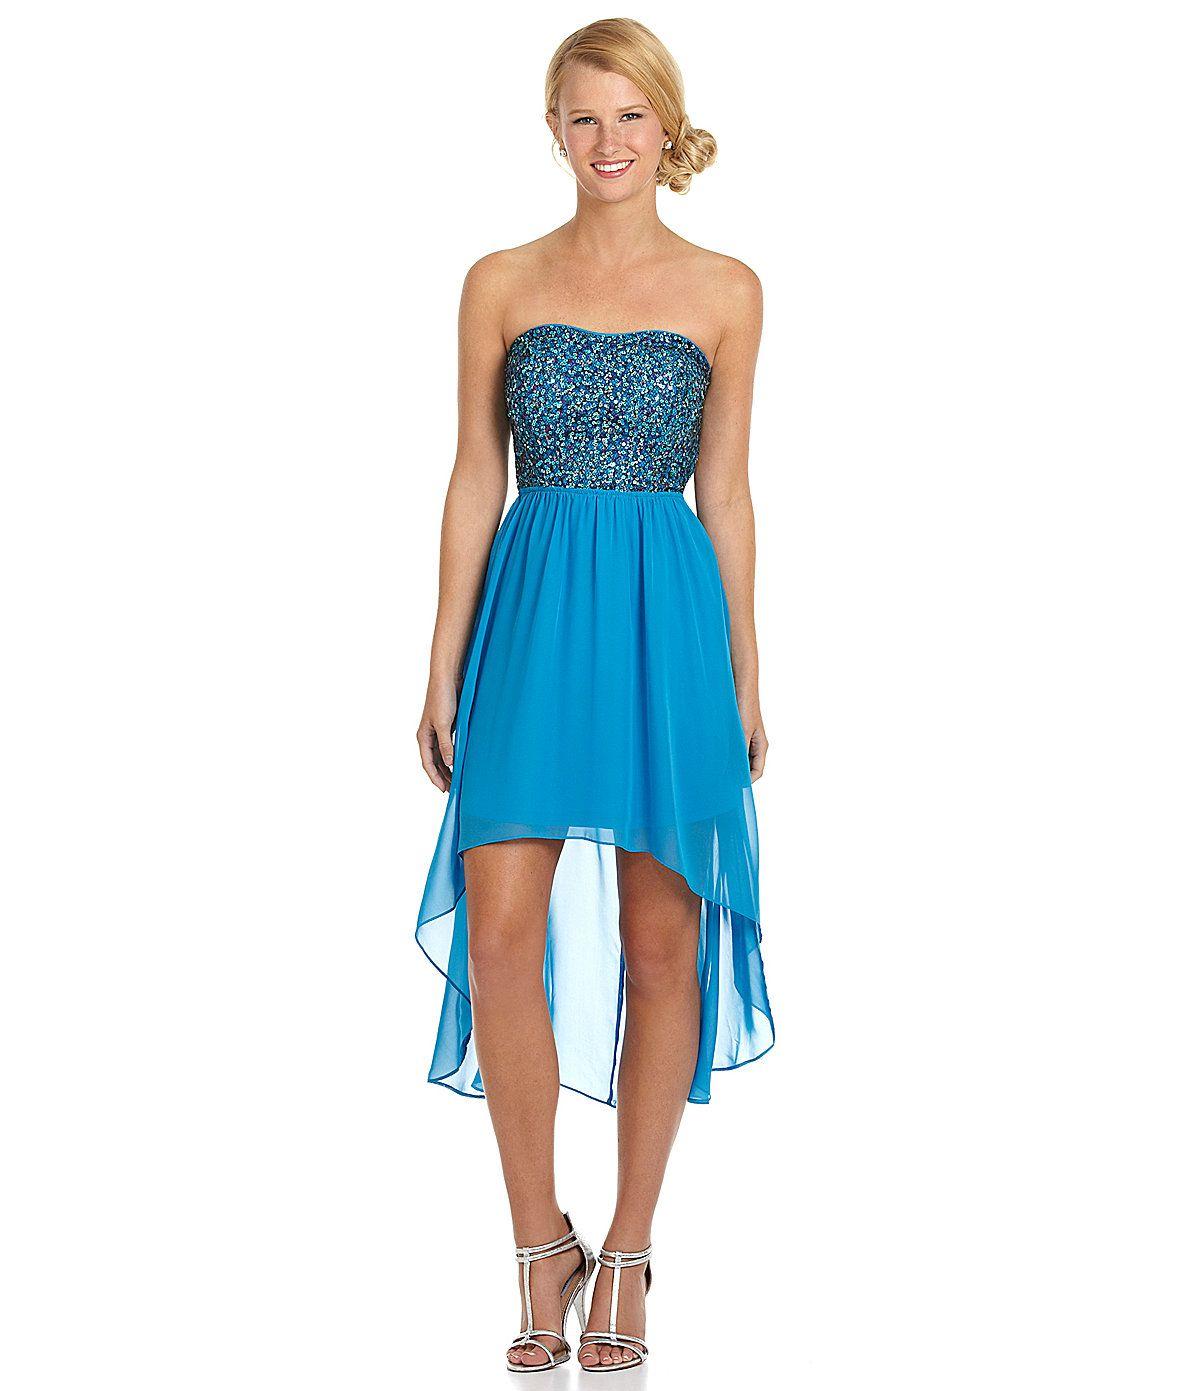 Magnificent Hailey Logan Prom Dresses Crest - All Wedding Dresses ...